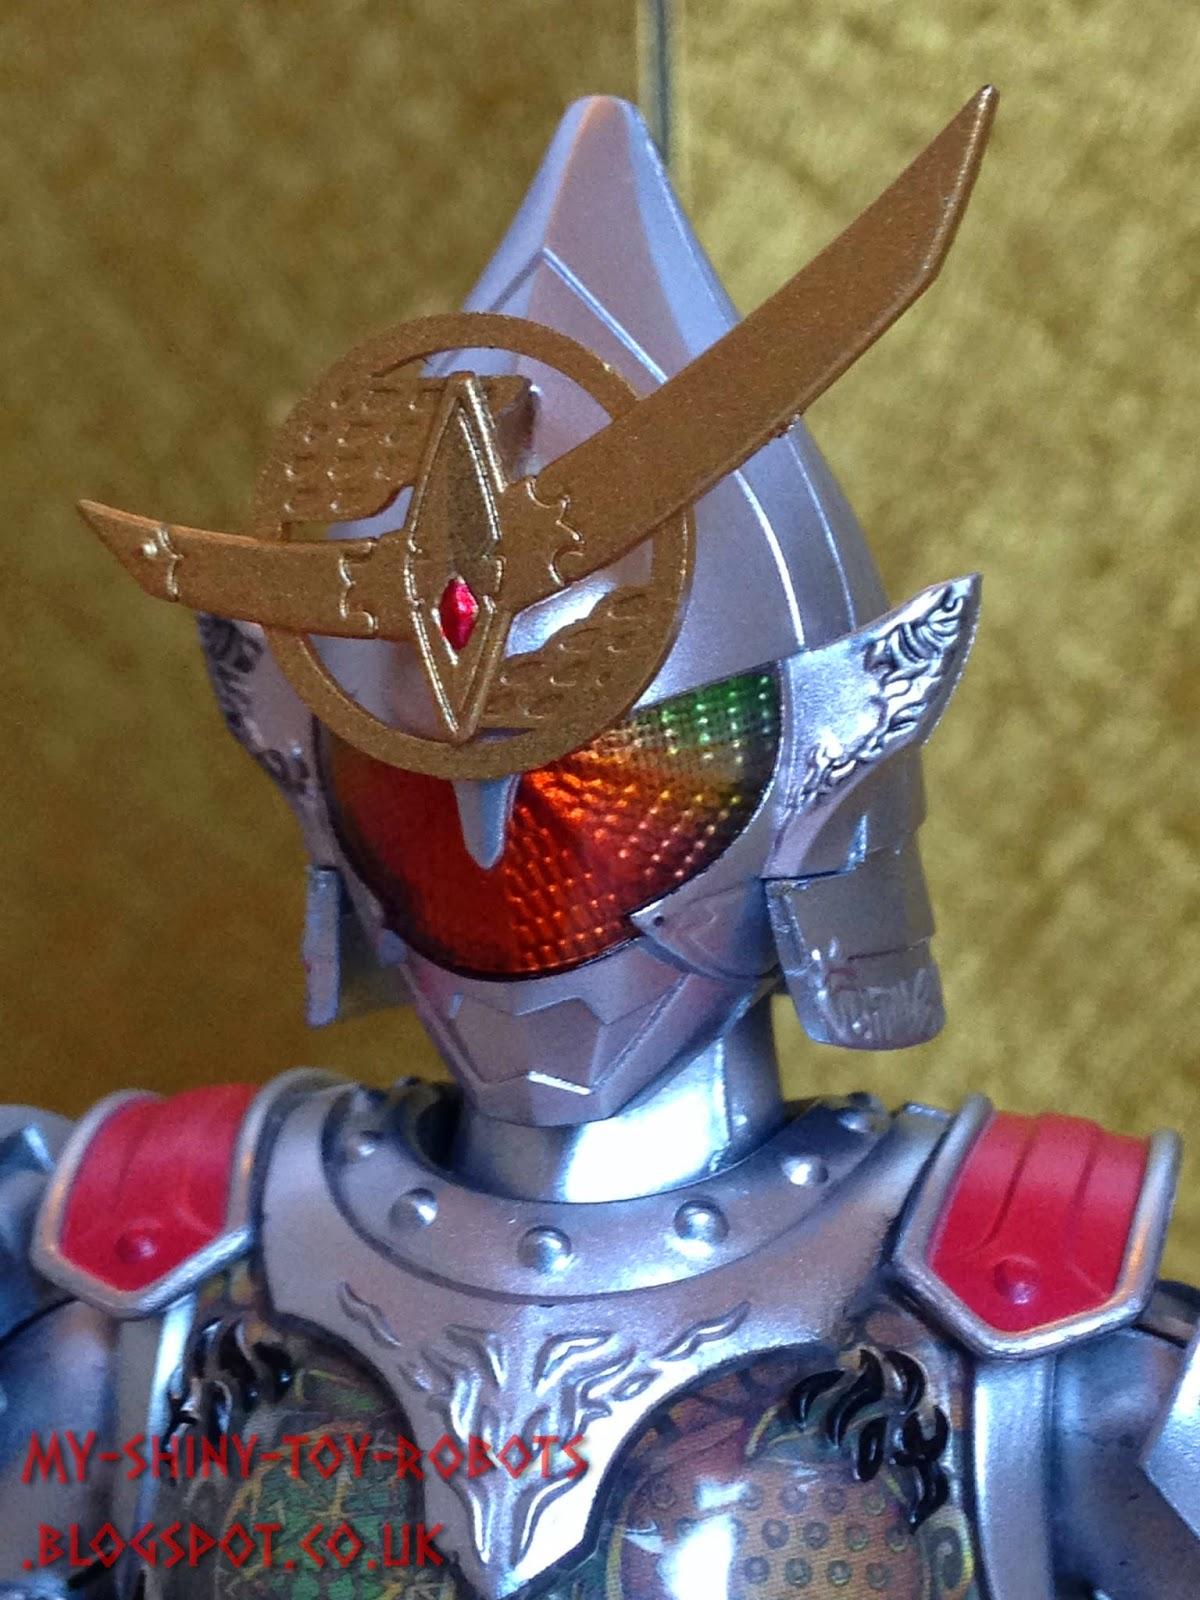 S.H. Figuarts Kamen Rider Gaim Kiwami Arms